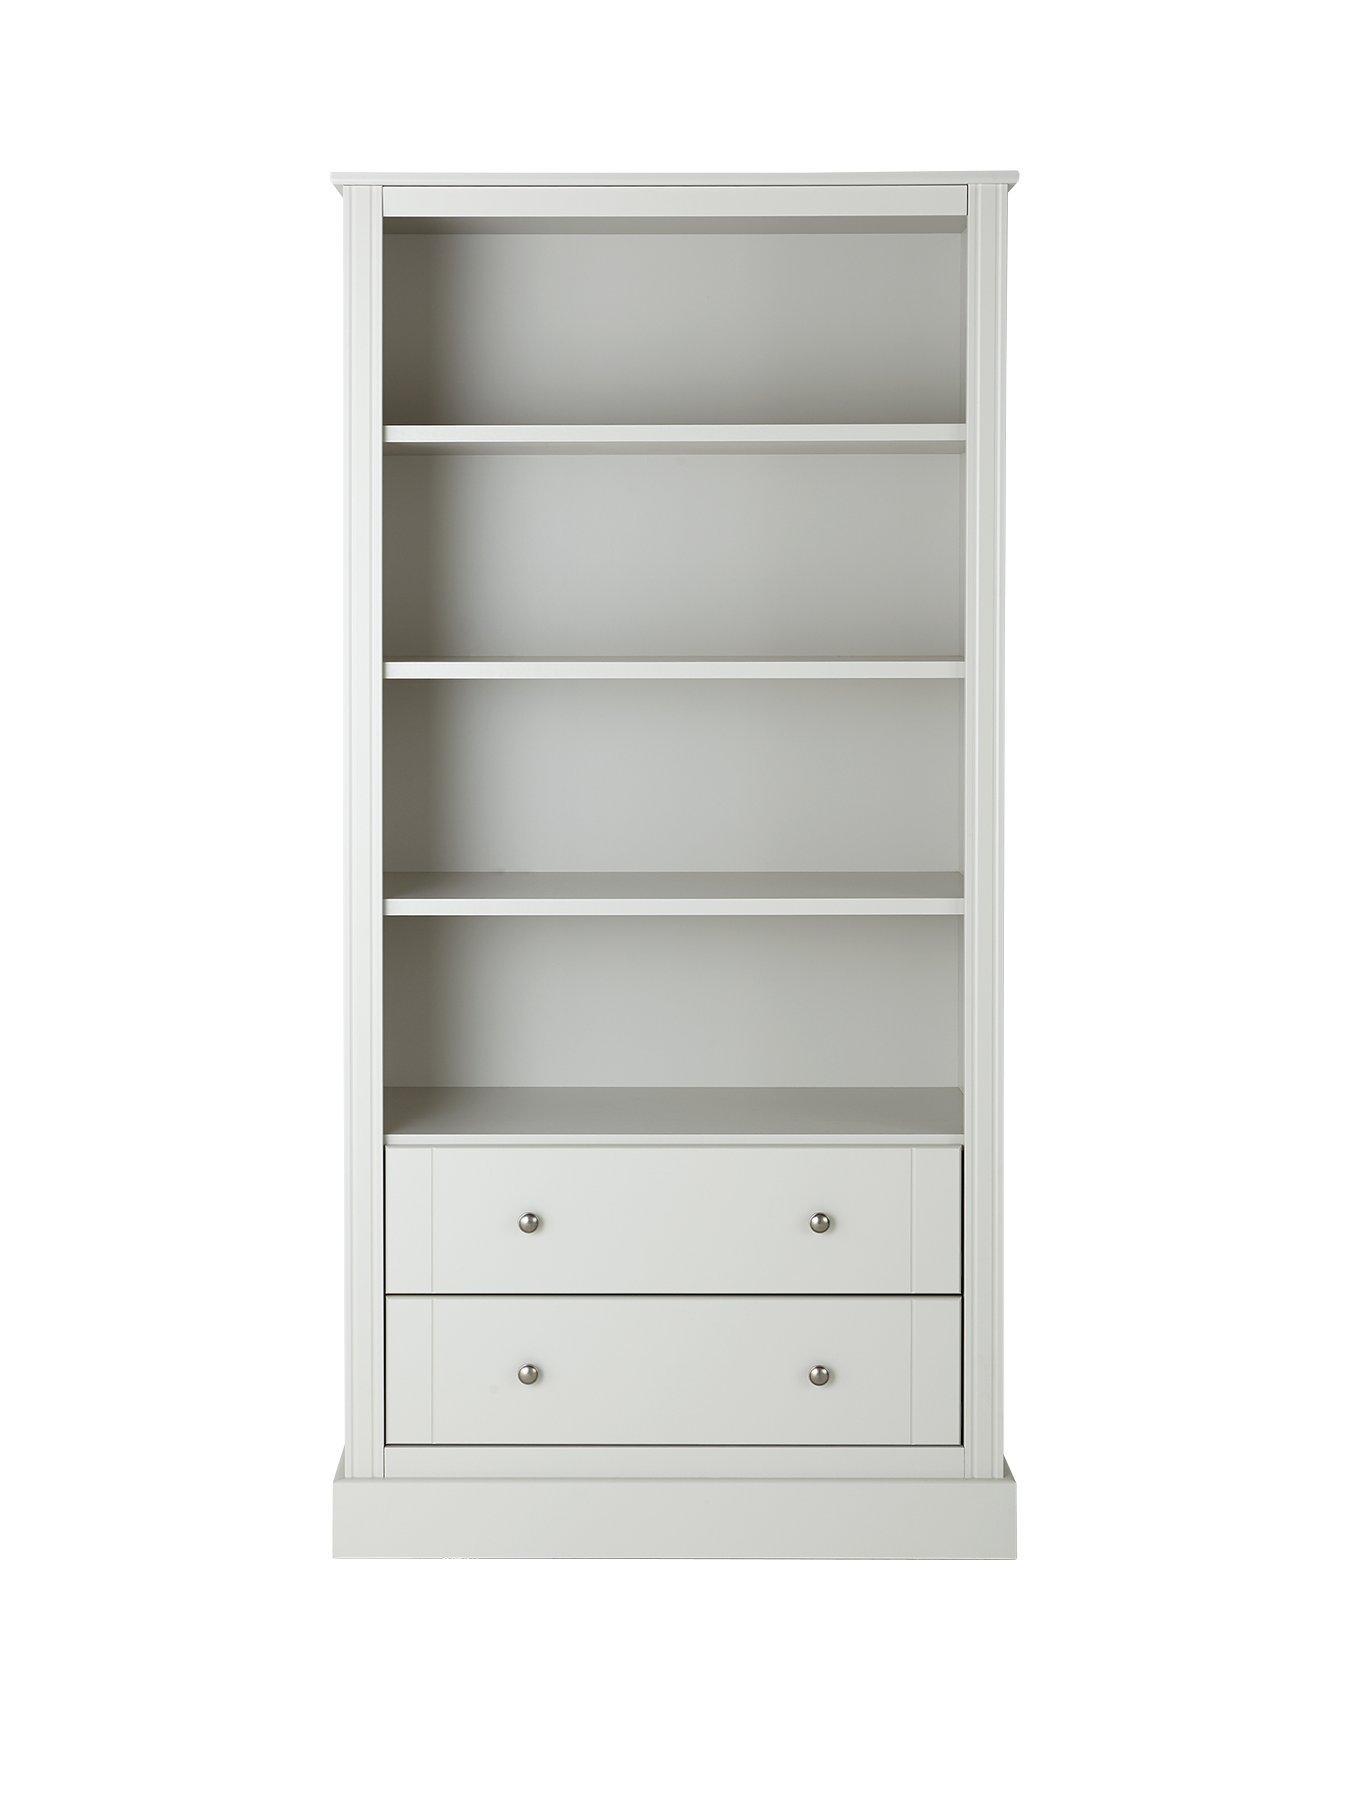 mainstays 5 shelf bookcase instructions pdf